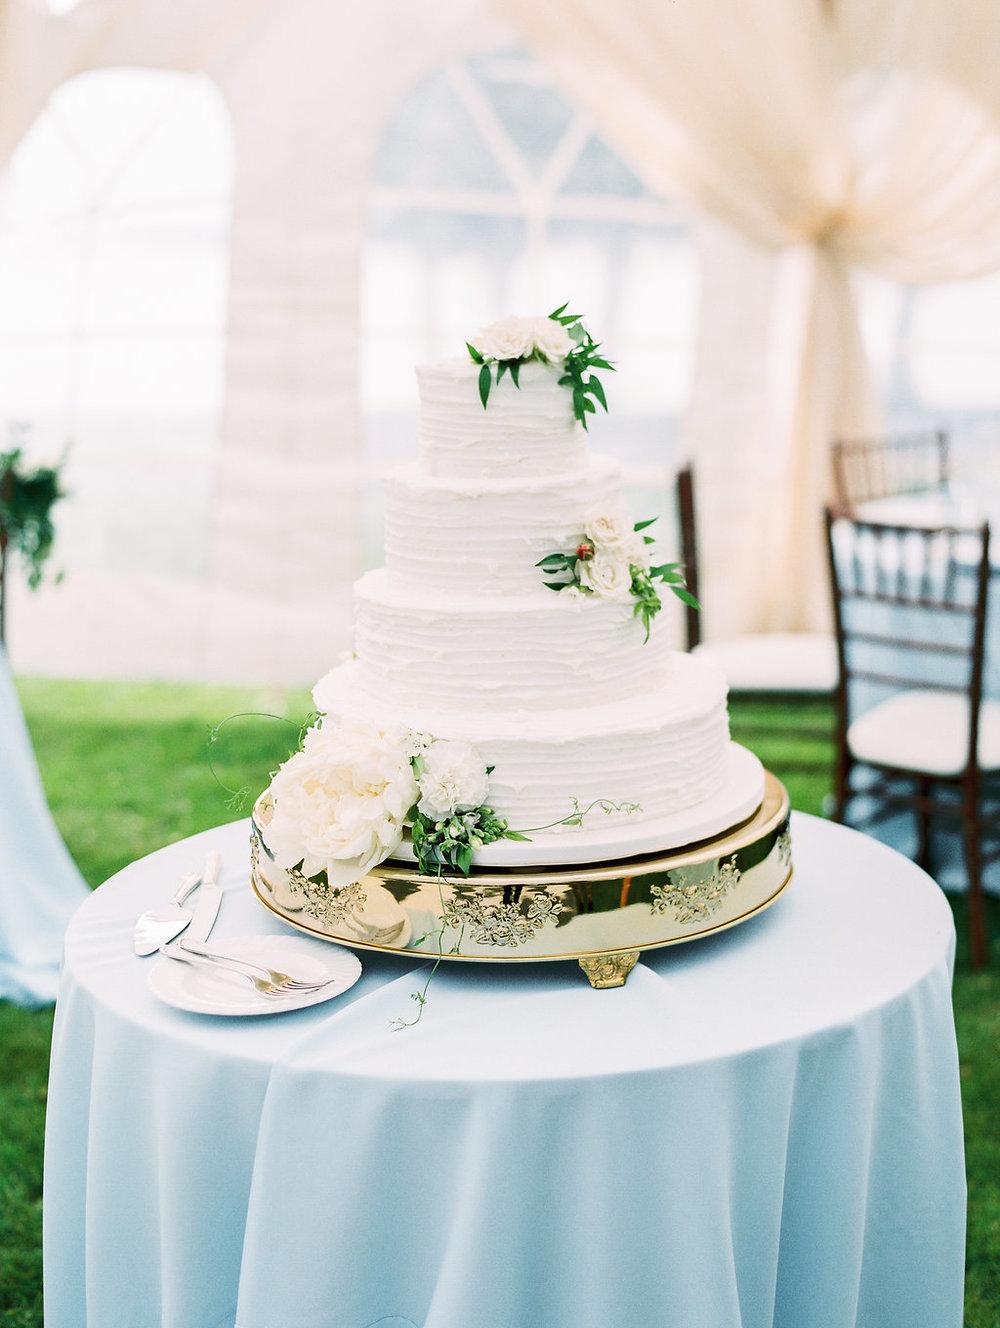 Webb+Wedding+Reception+Details-25.jpg